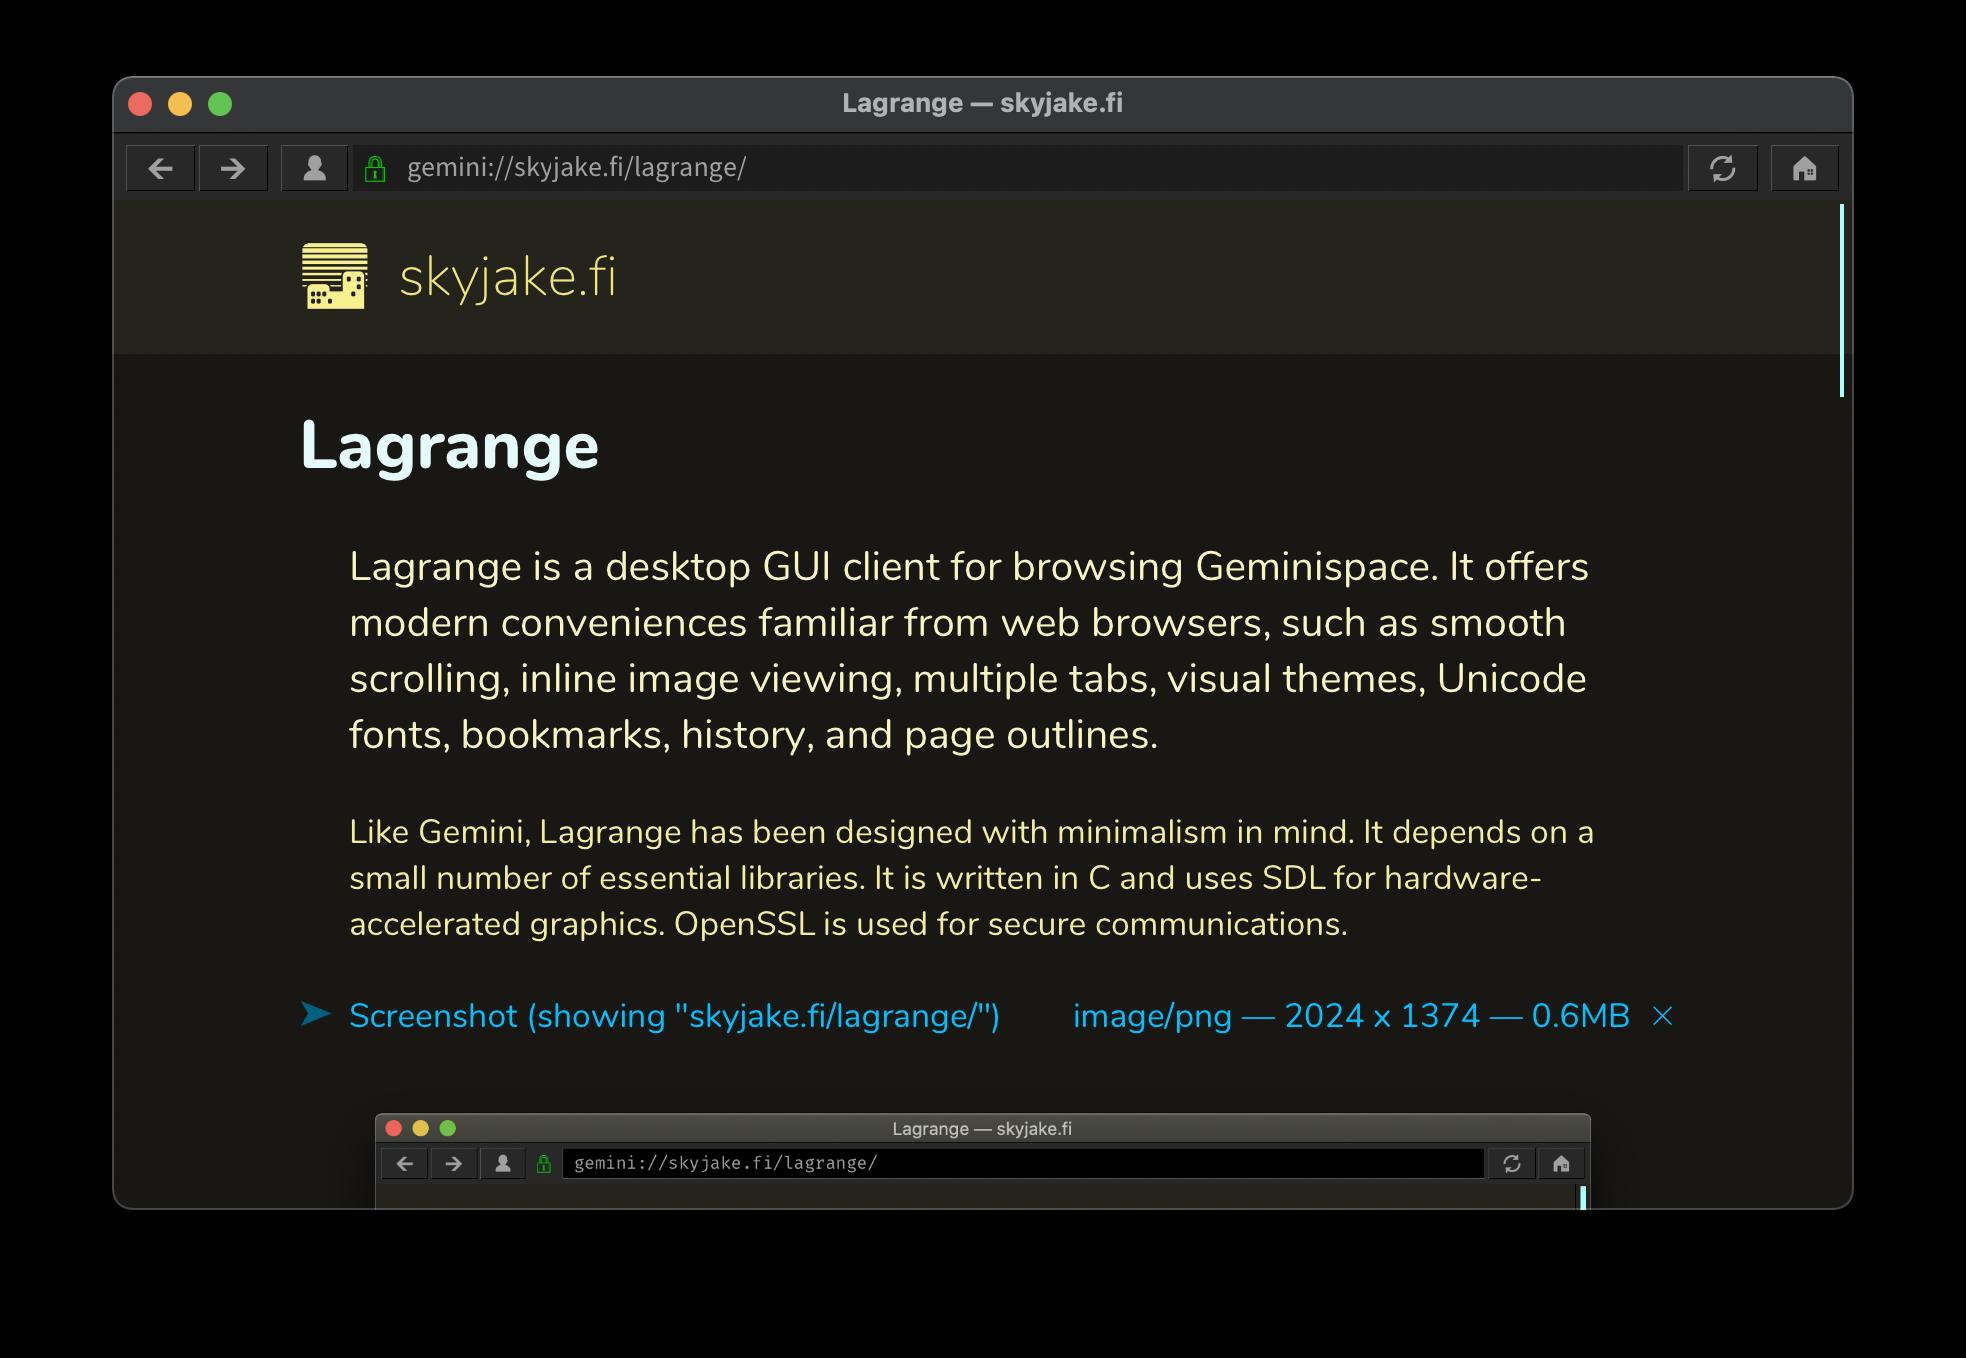 Screenshot of Lagrange browser on a Mac